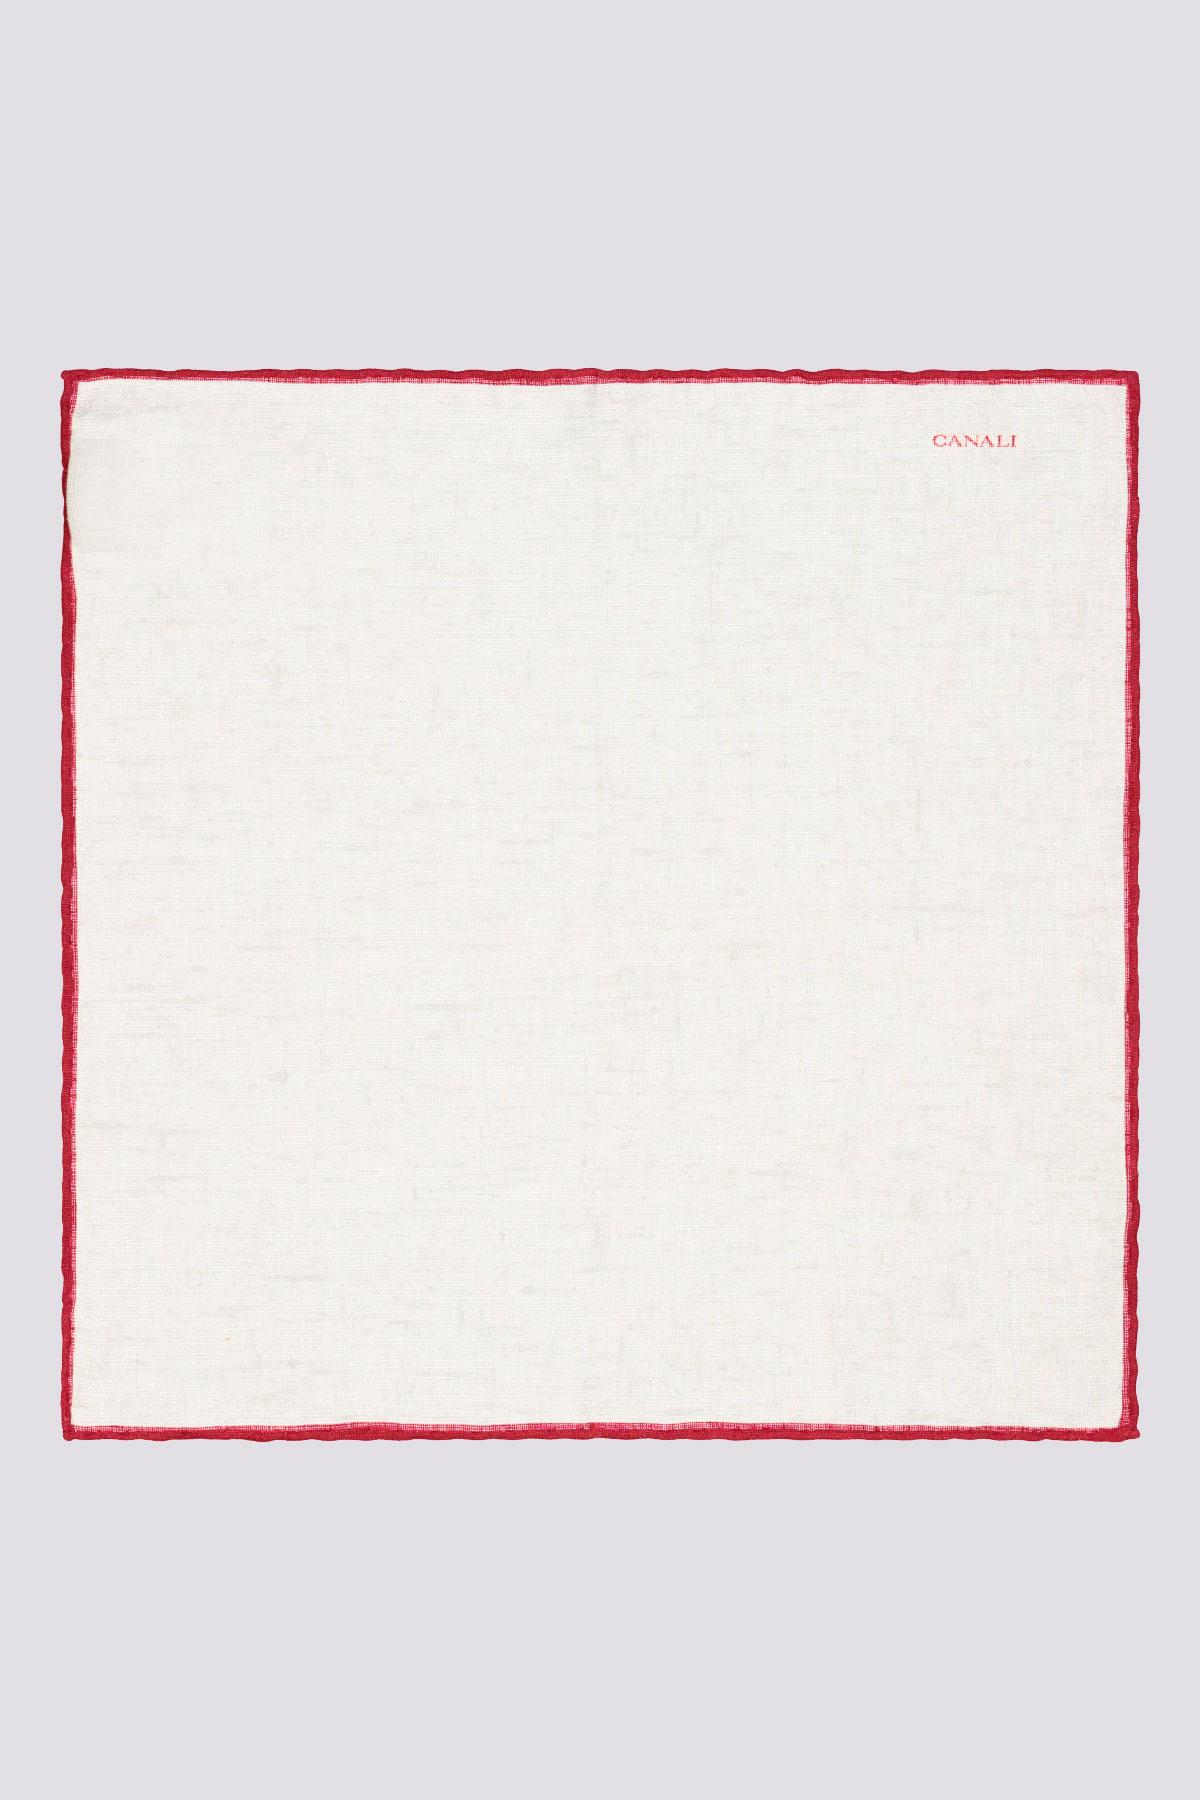 Pañuelo blanco marca CANALI con ribete de color